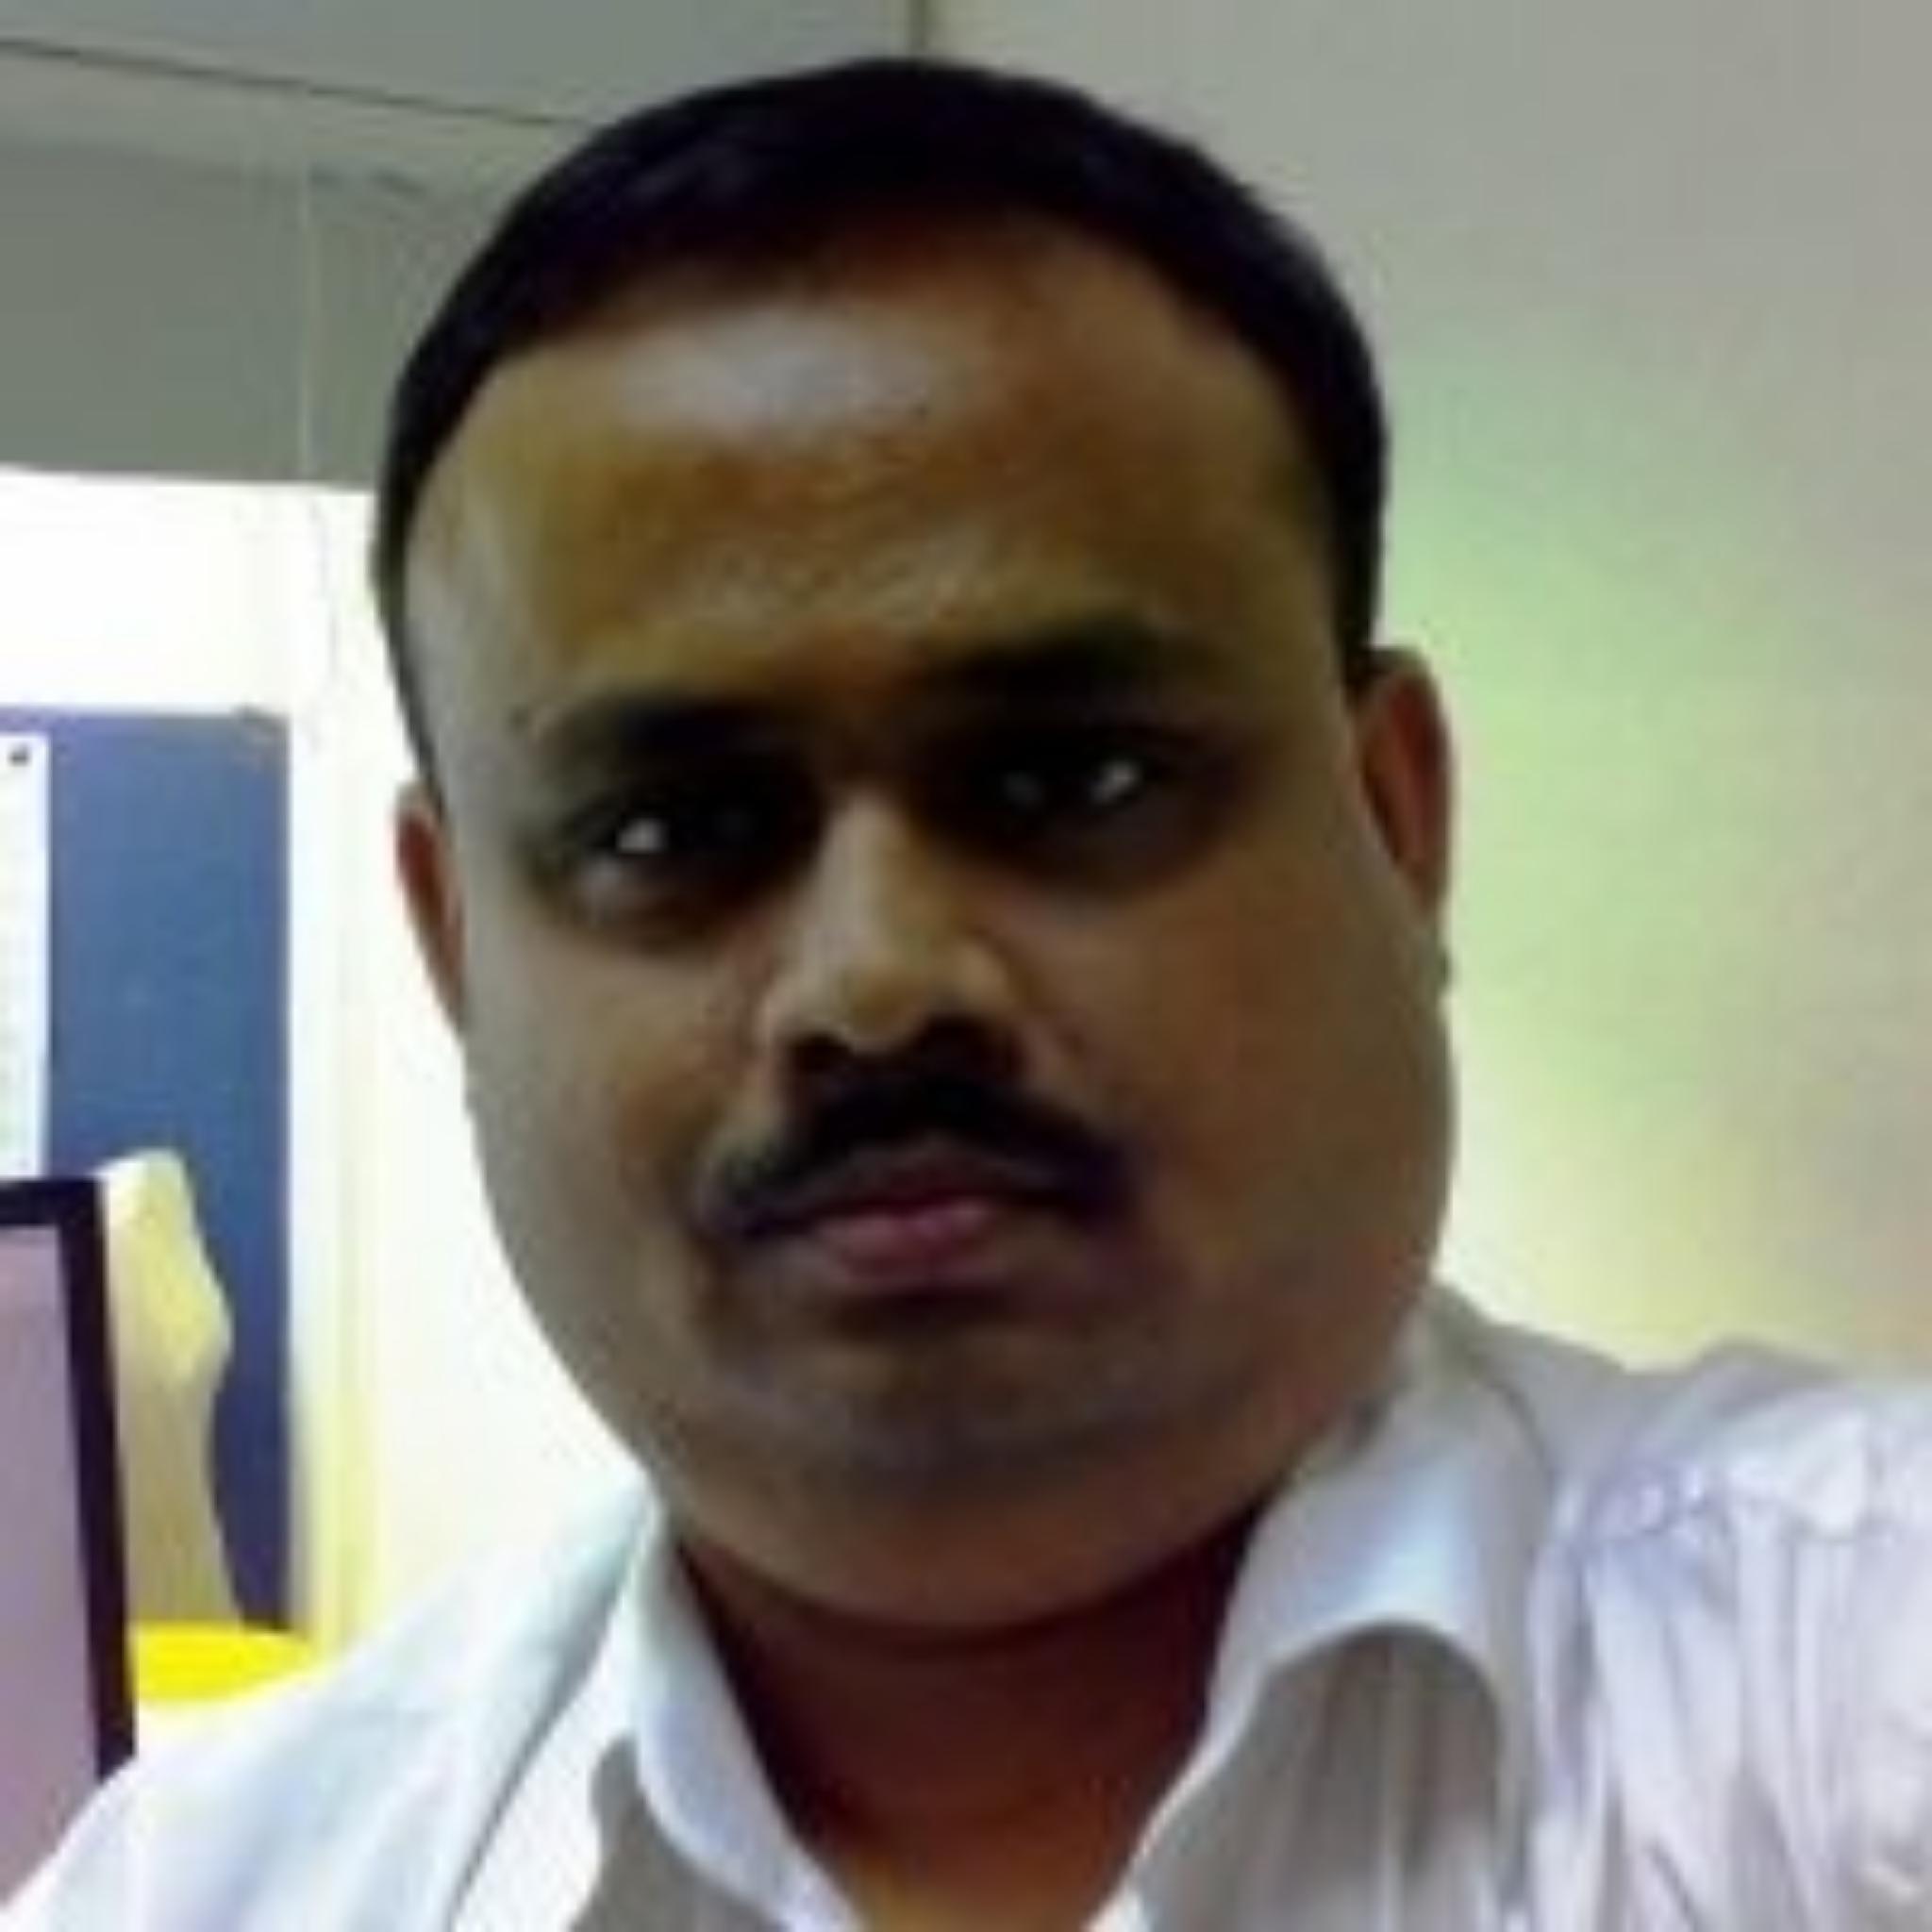 https://www.indiantelevision.com/sites/default/files/styles/smartcrop_800x800/public/images/tv-images/2021/07/05/photogrid_plus_1625489845837.jpg?itok=_nuyeUBo